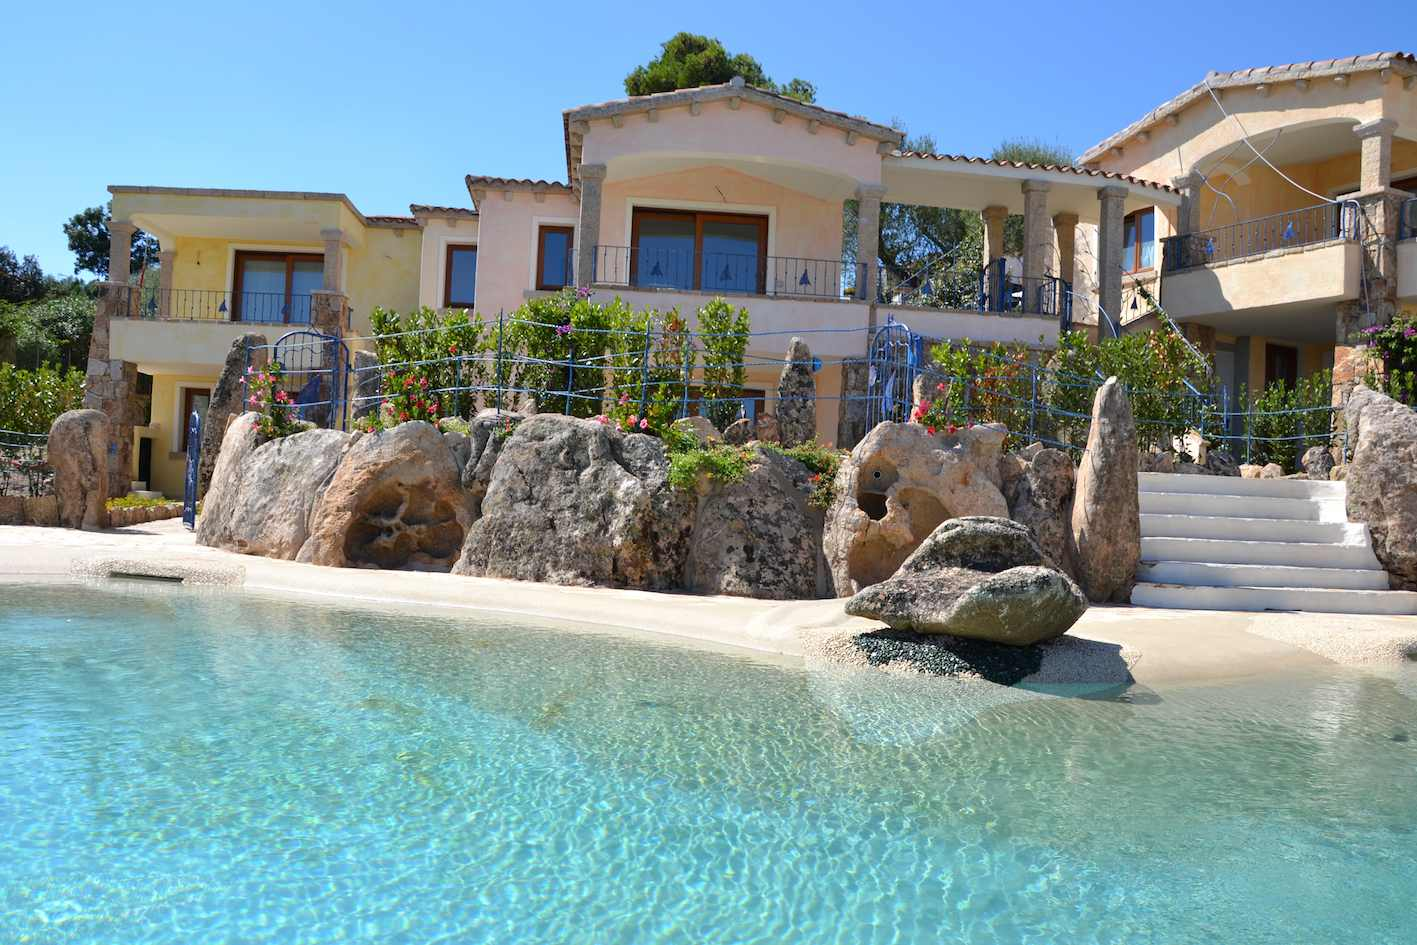 Ville bellissime ville da sogno hearst castle with ville for Belle case con piscine